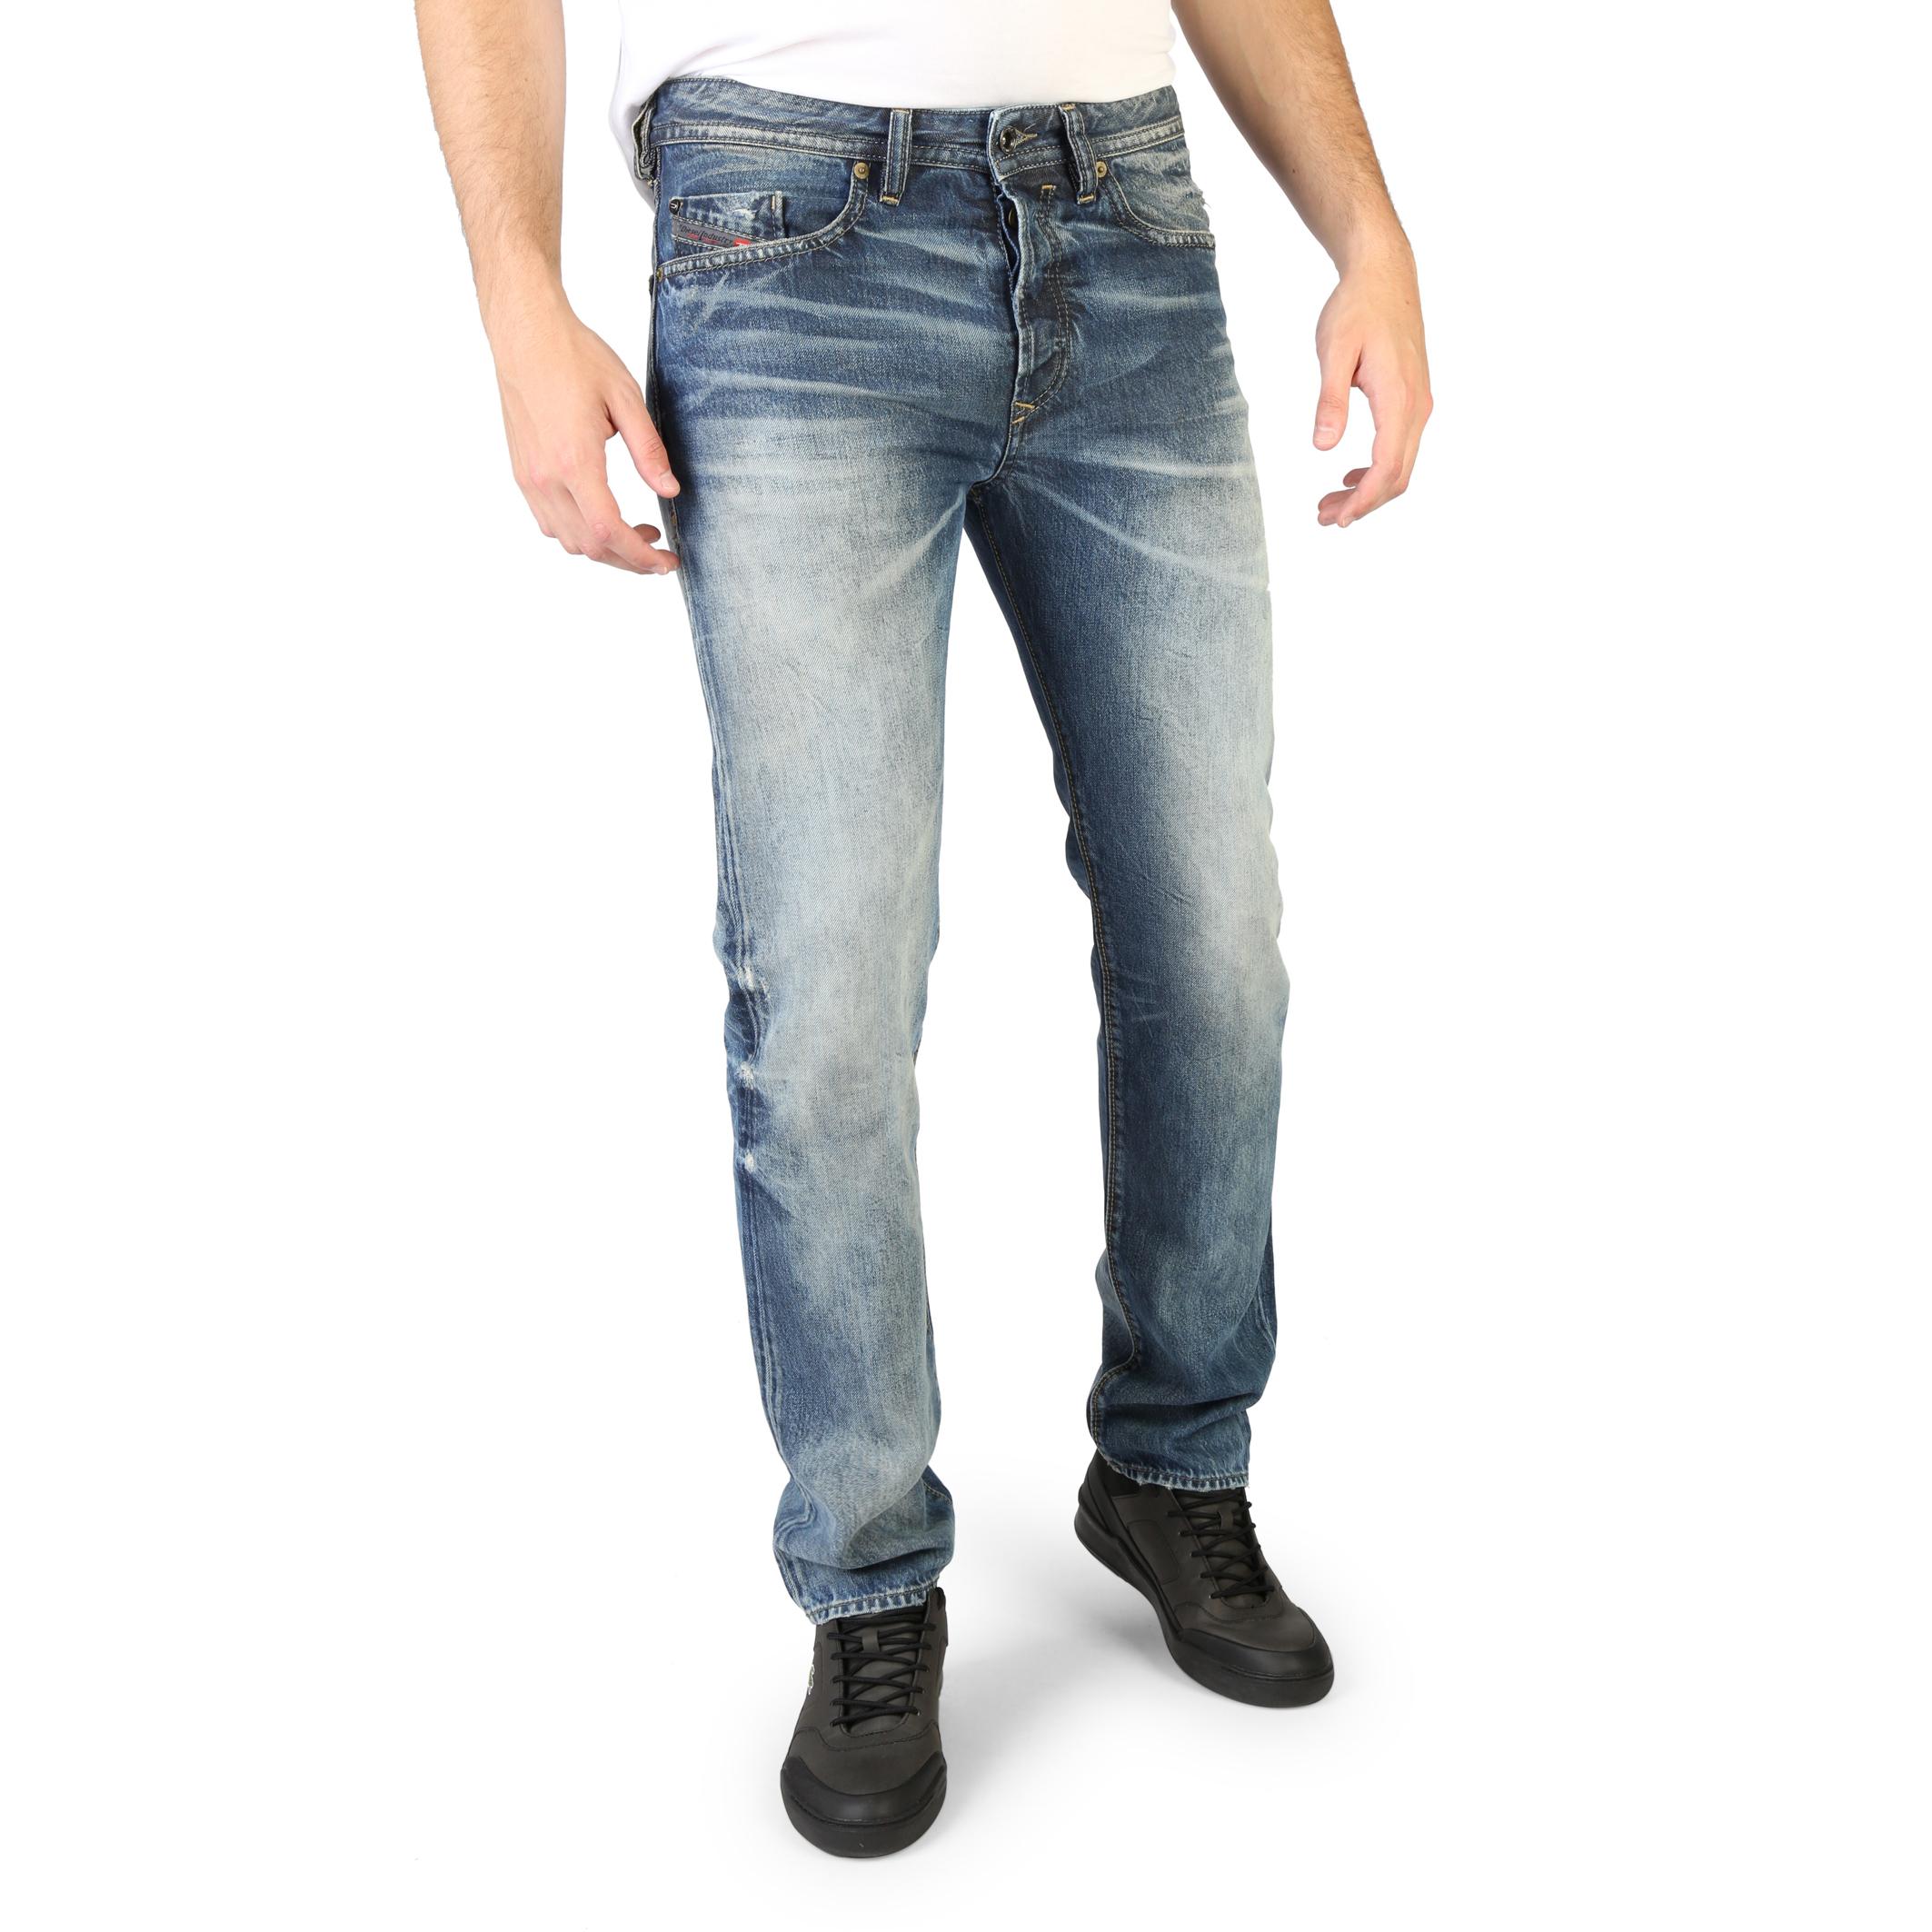 Jeans Diesel BUSTER_L32_00SDHB Uomo Blu 91457